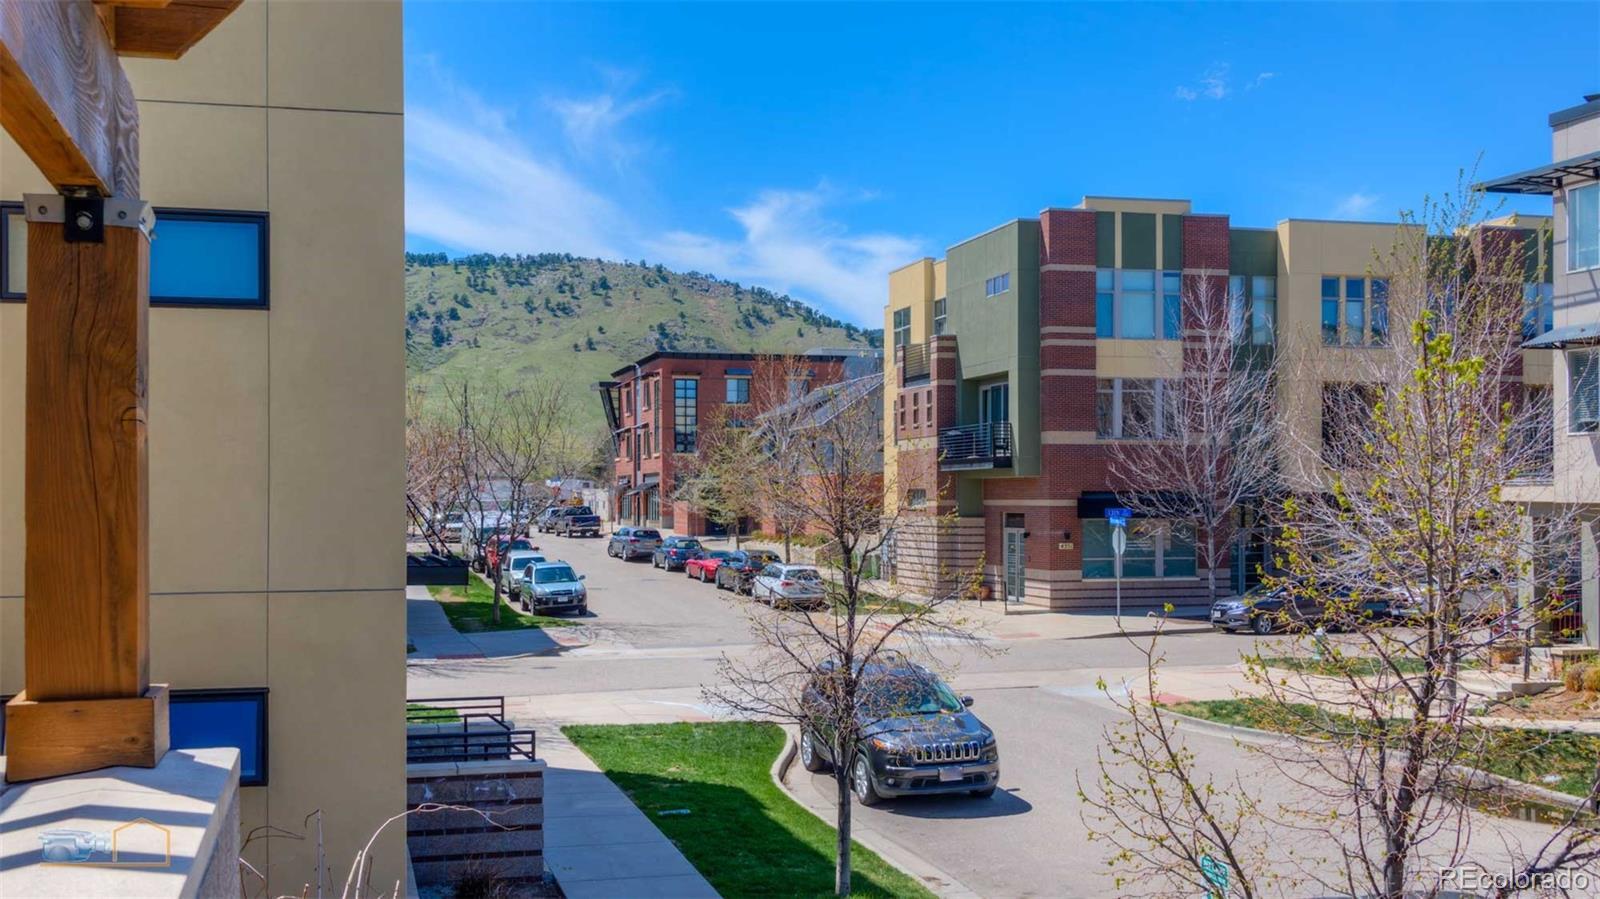 MLS# 8253378 - 5 - 1350 Rosewood Avenue, Boulder, CO 80304